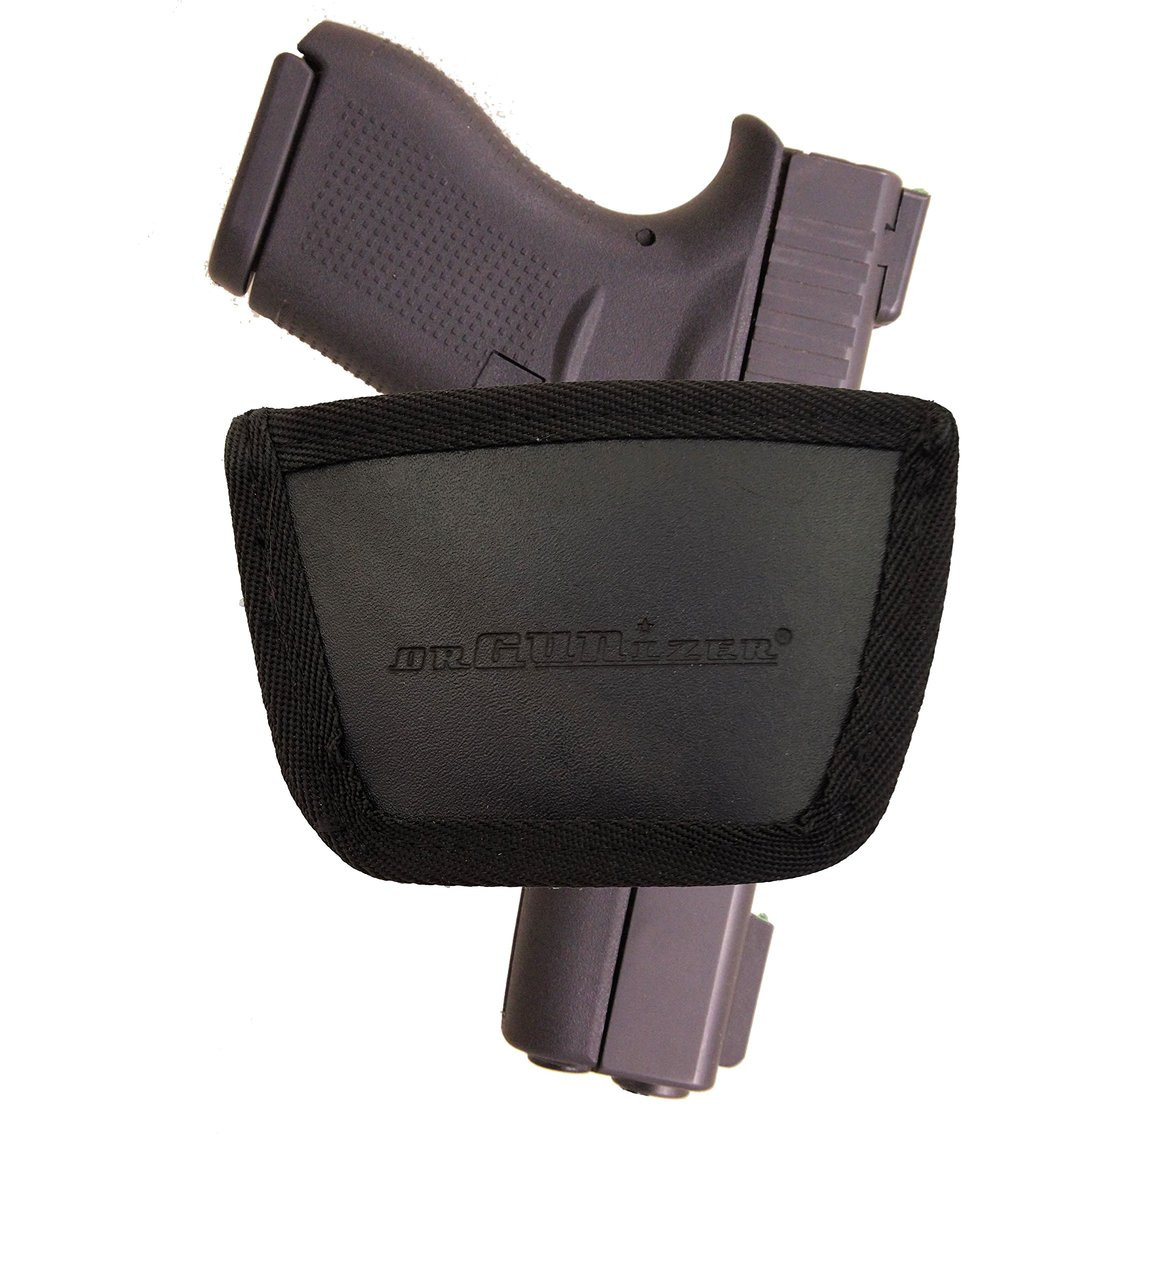 Garrison Grip Leather Inside and Outside Waistband Easy Slide Holster Fits Glock 43 (SAF)